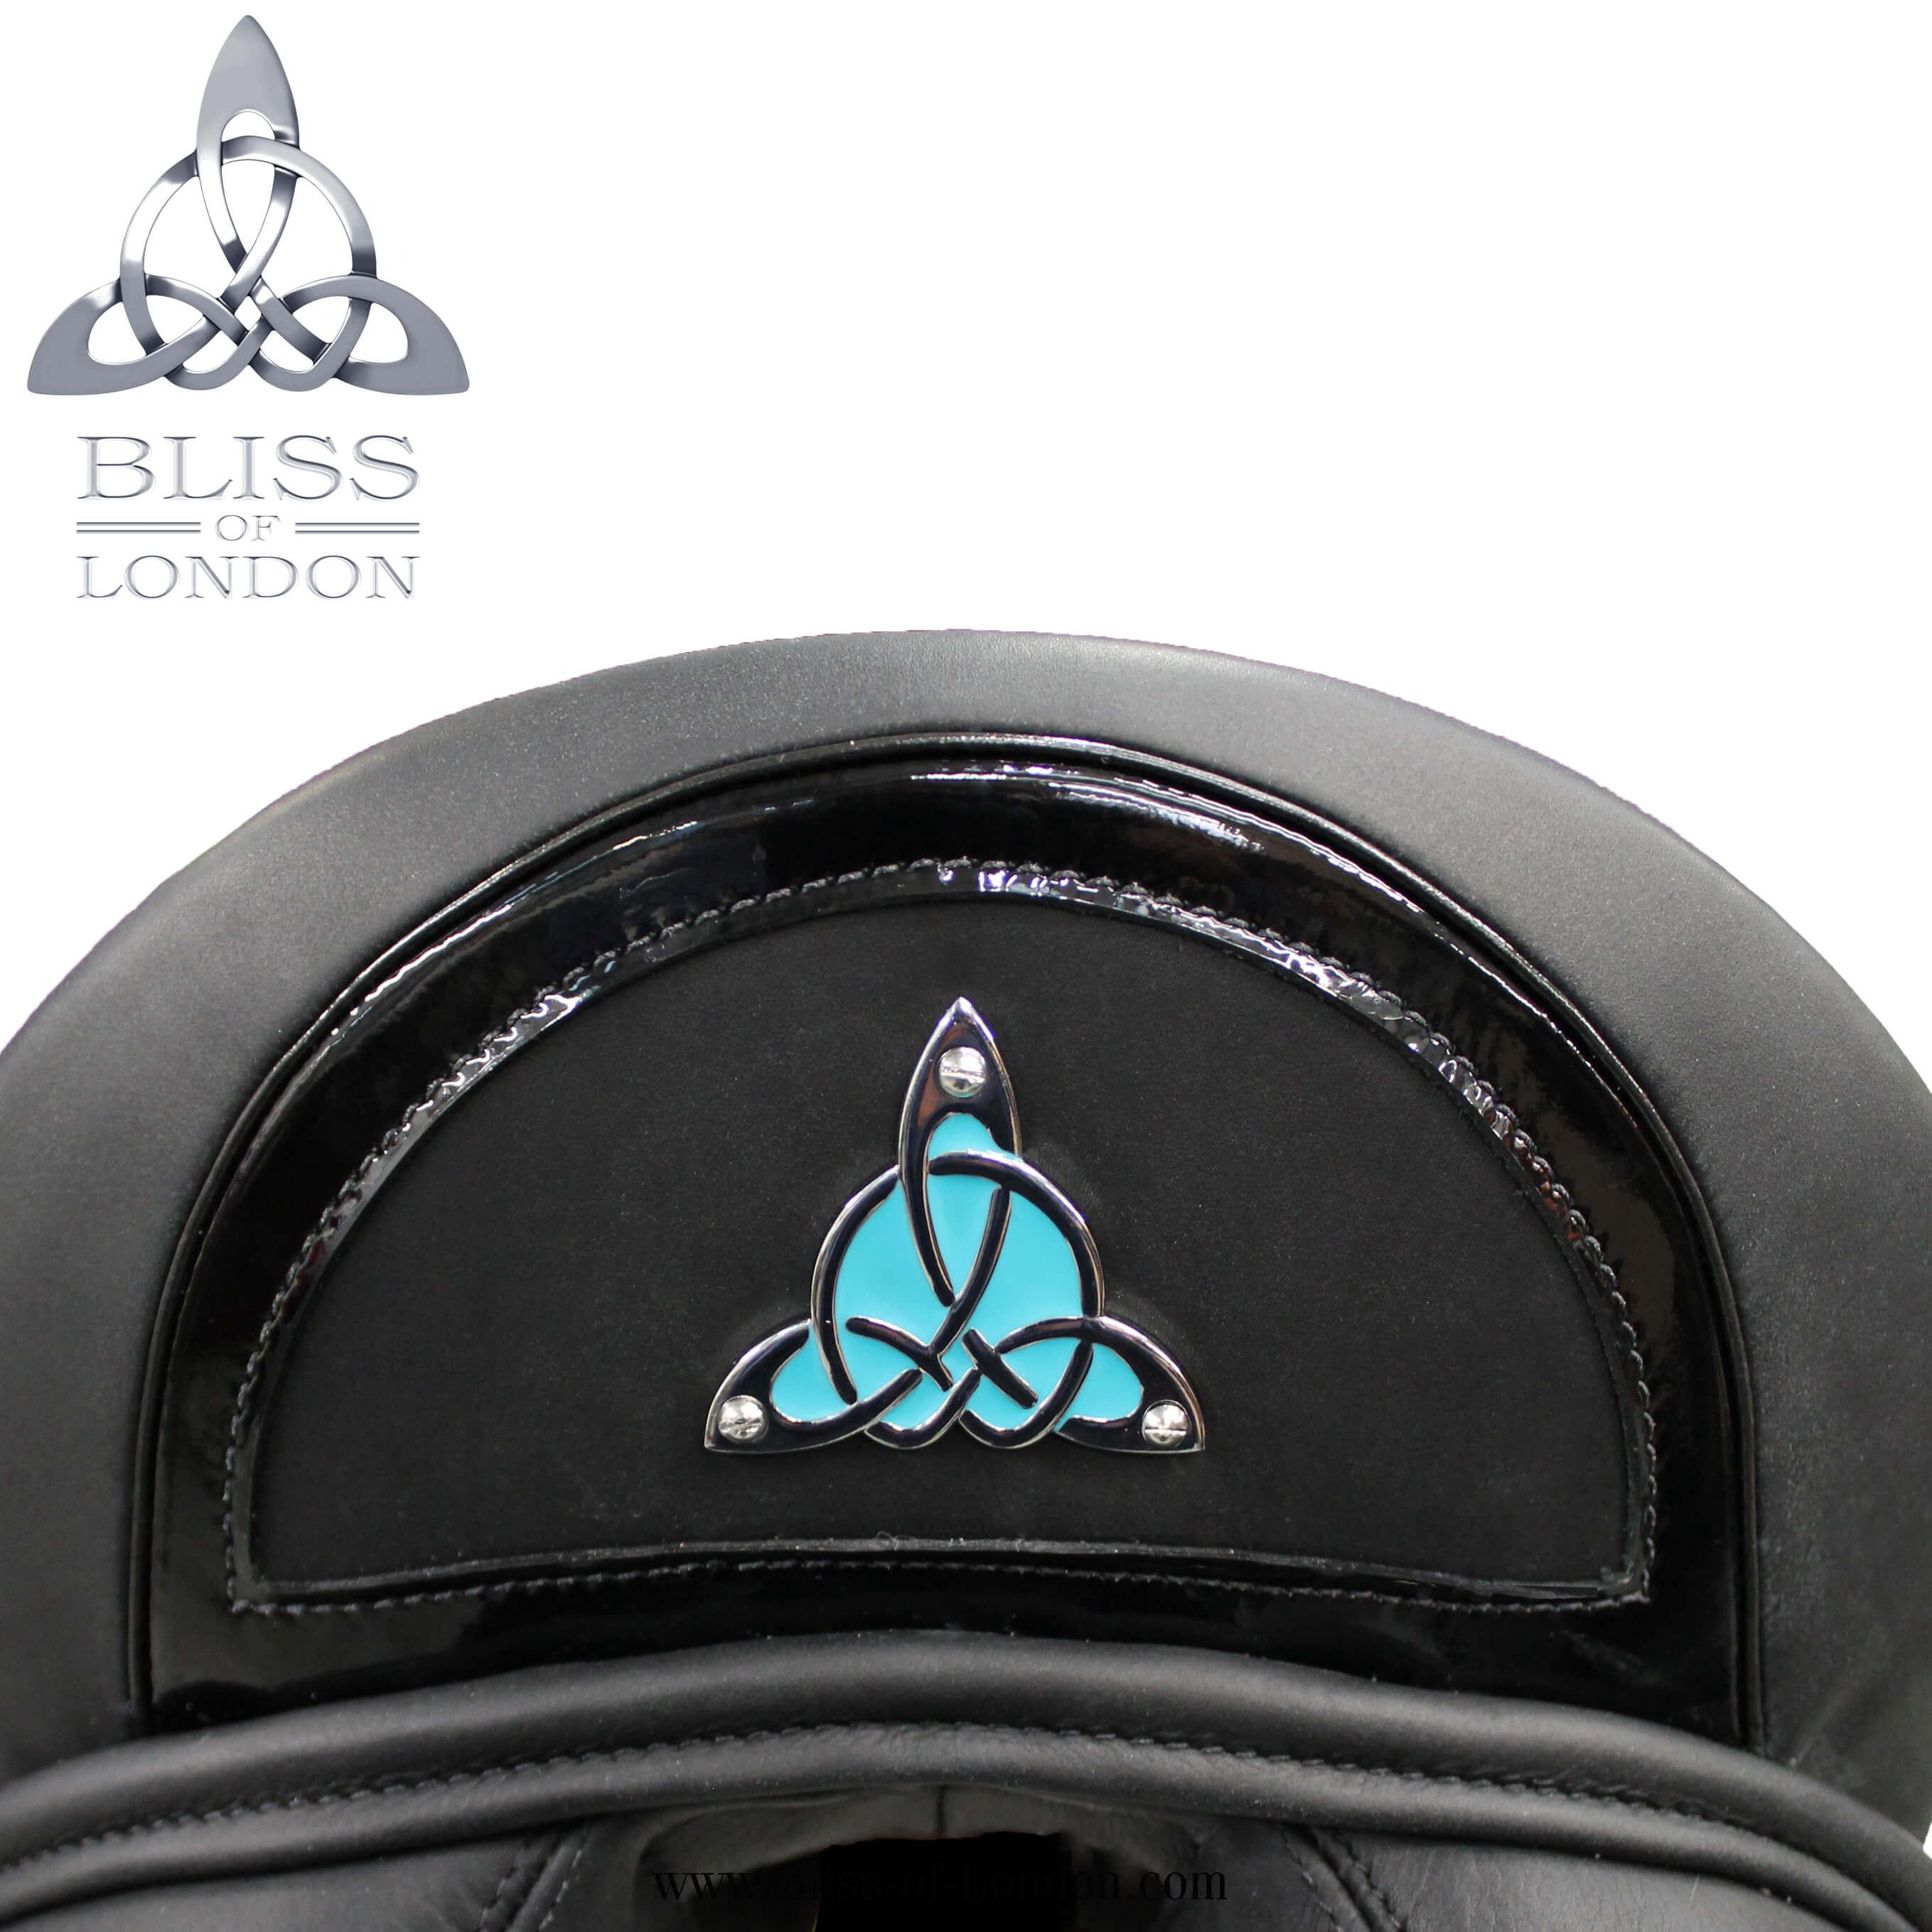 735 - Paramour Dressage Patent Halfmoon Cantle Badge